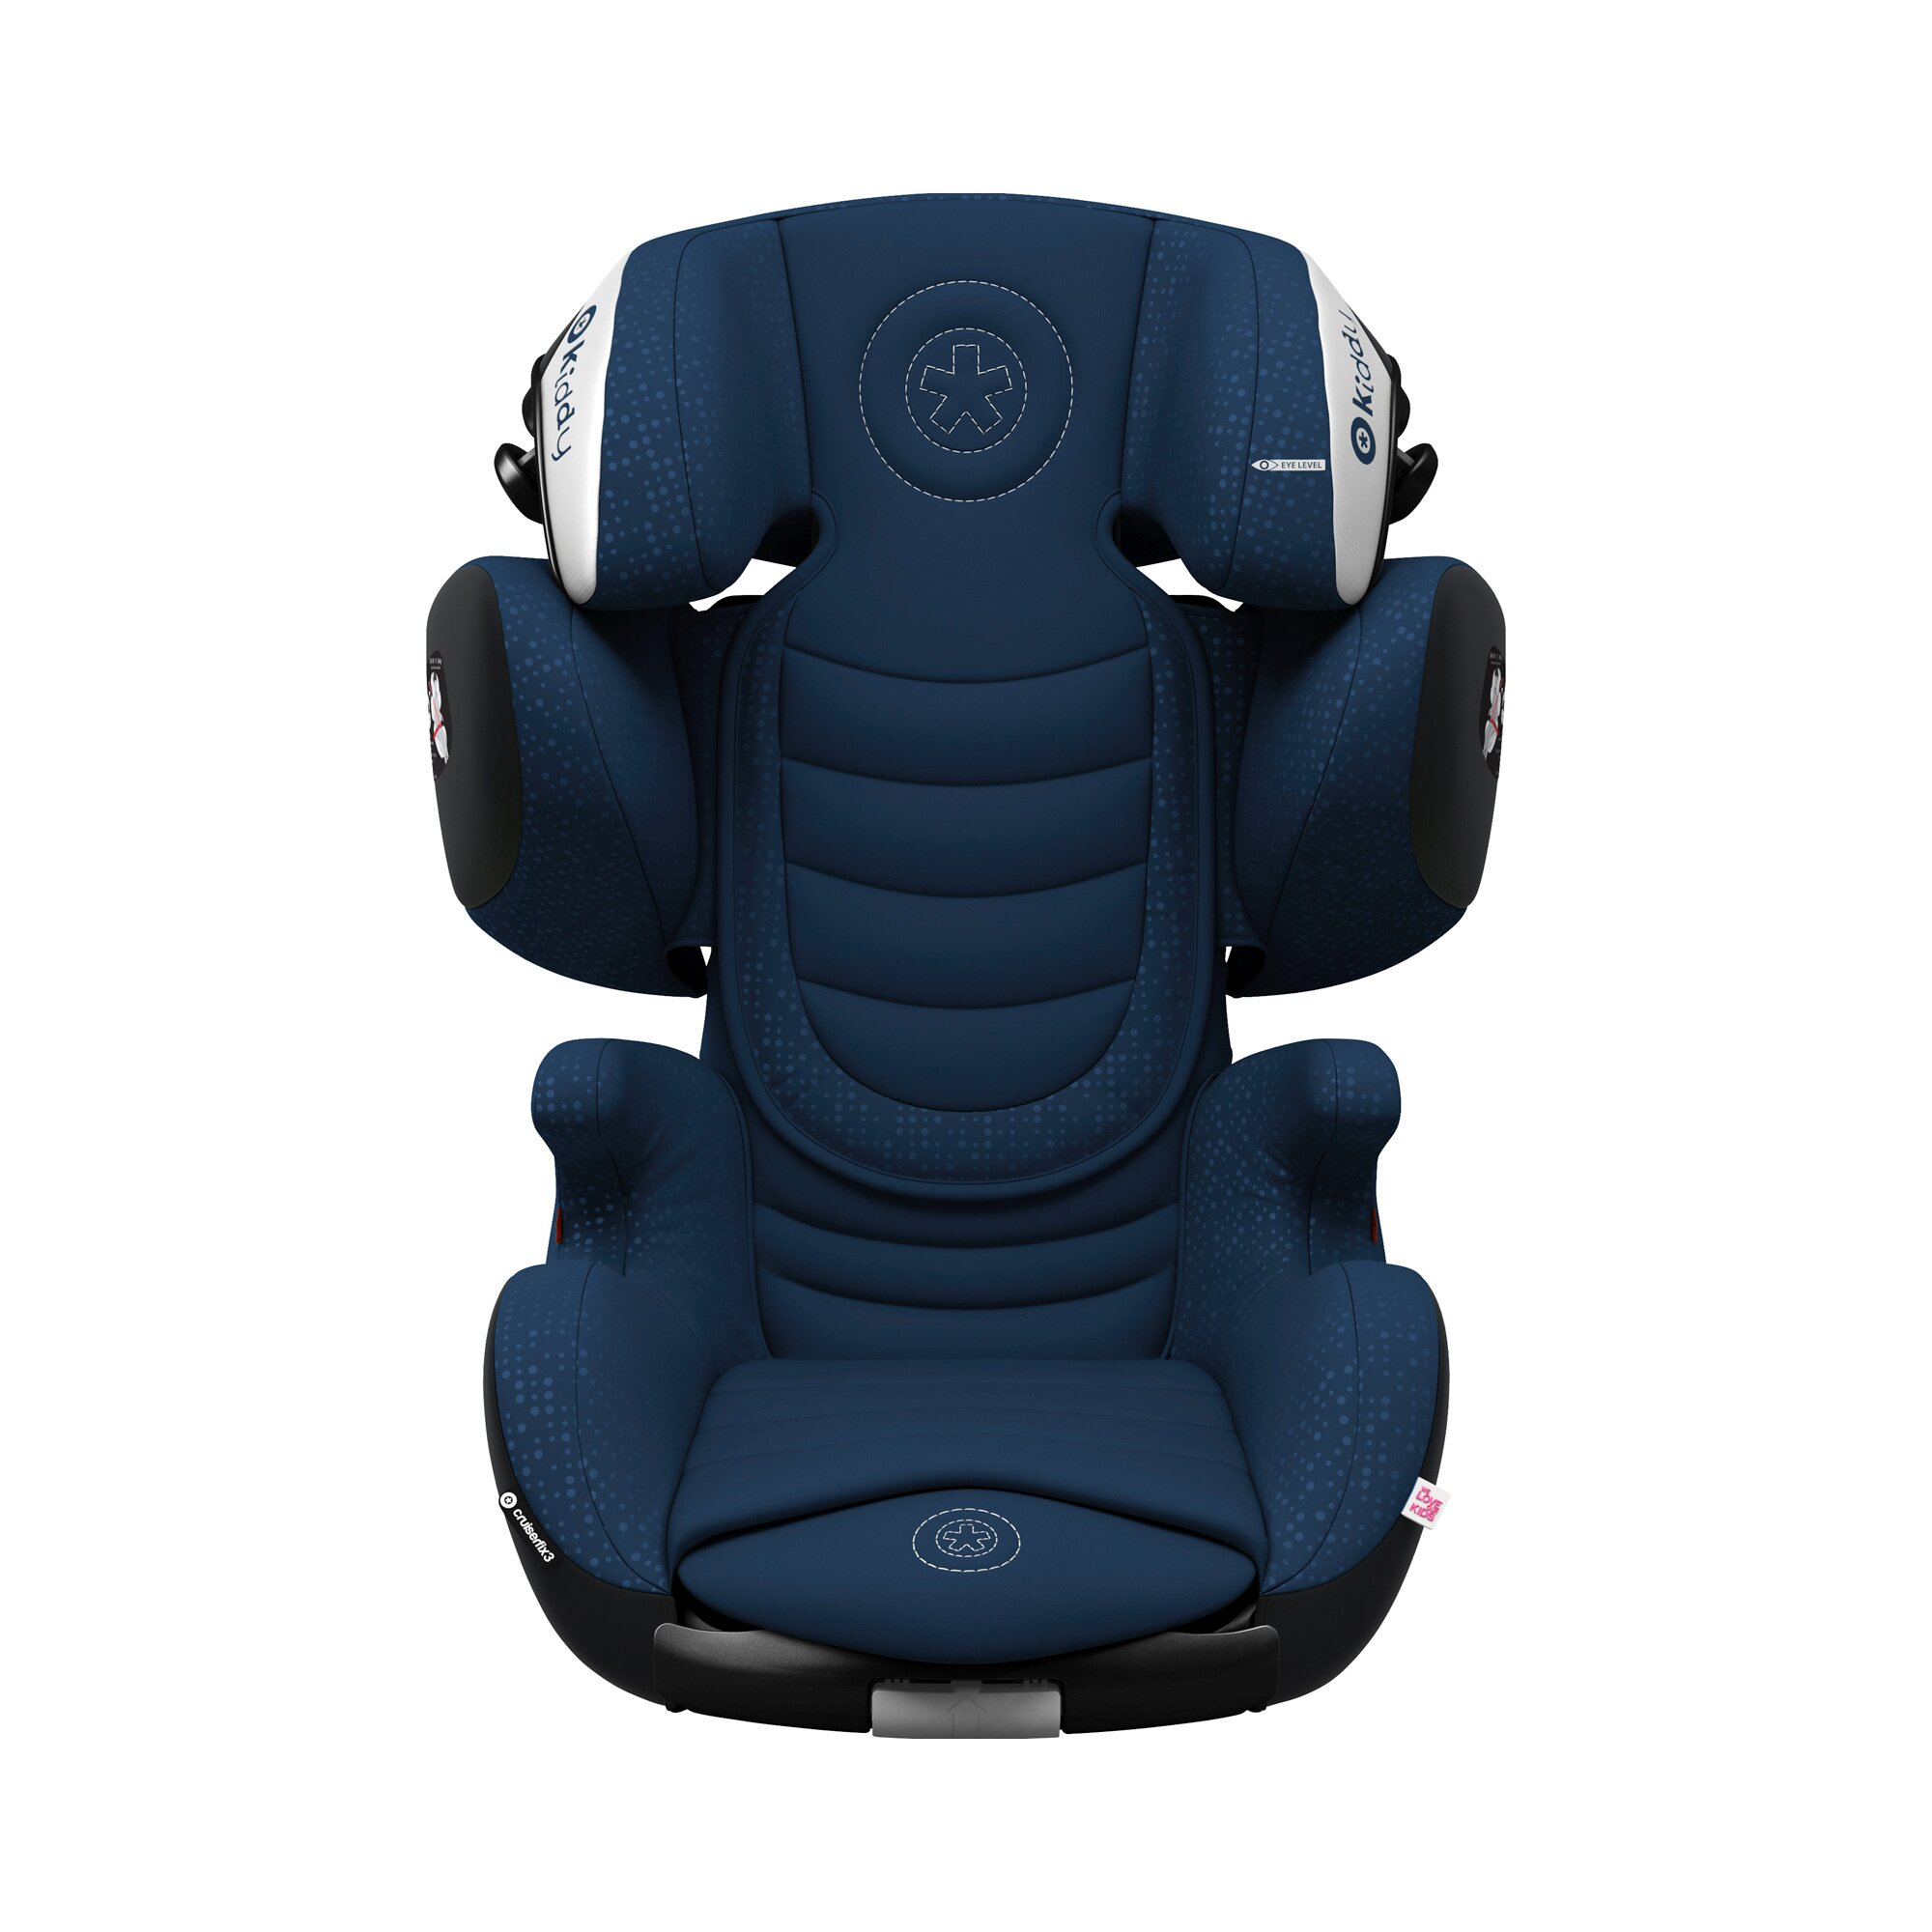 Cruiserfix 3 Kindersitz Design 2017 blau Preisvergleich